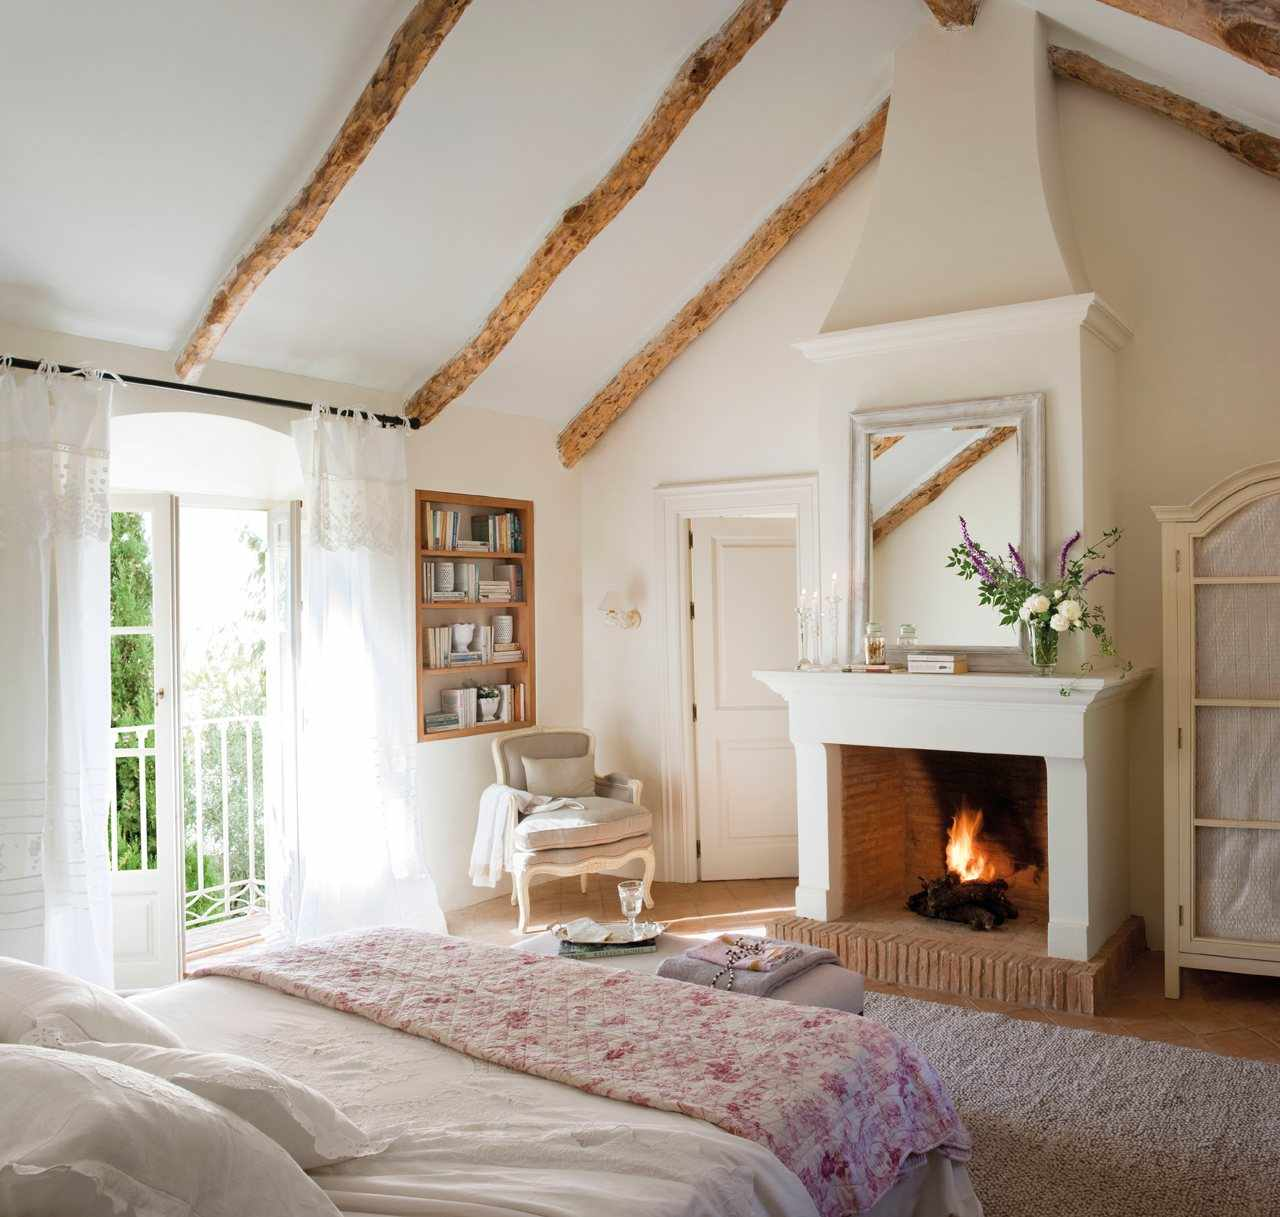 Cozy Bedroom Decor In Farmhouse Style Master Bedroom Ideas